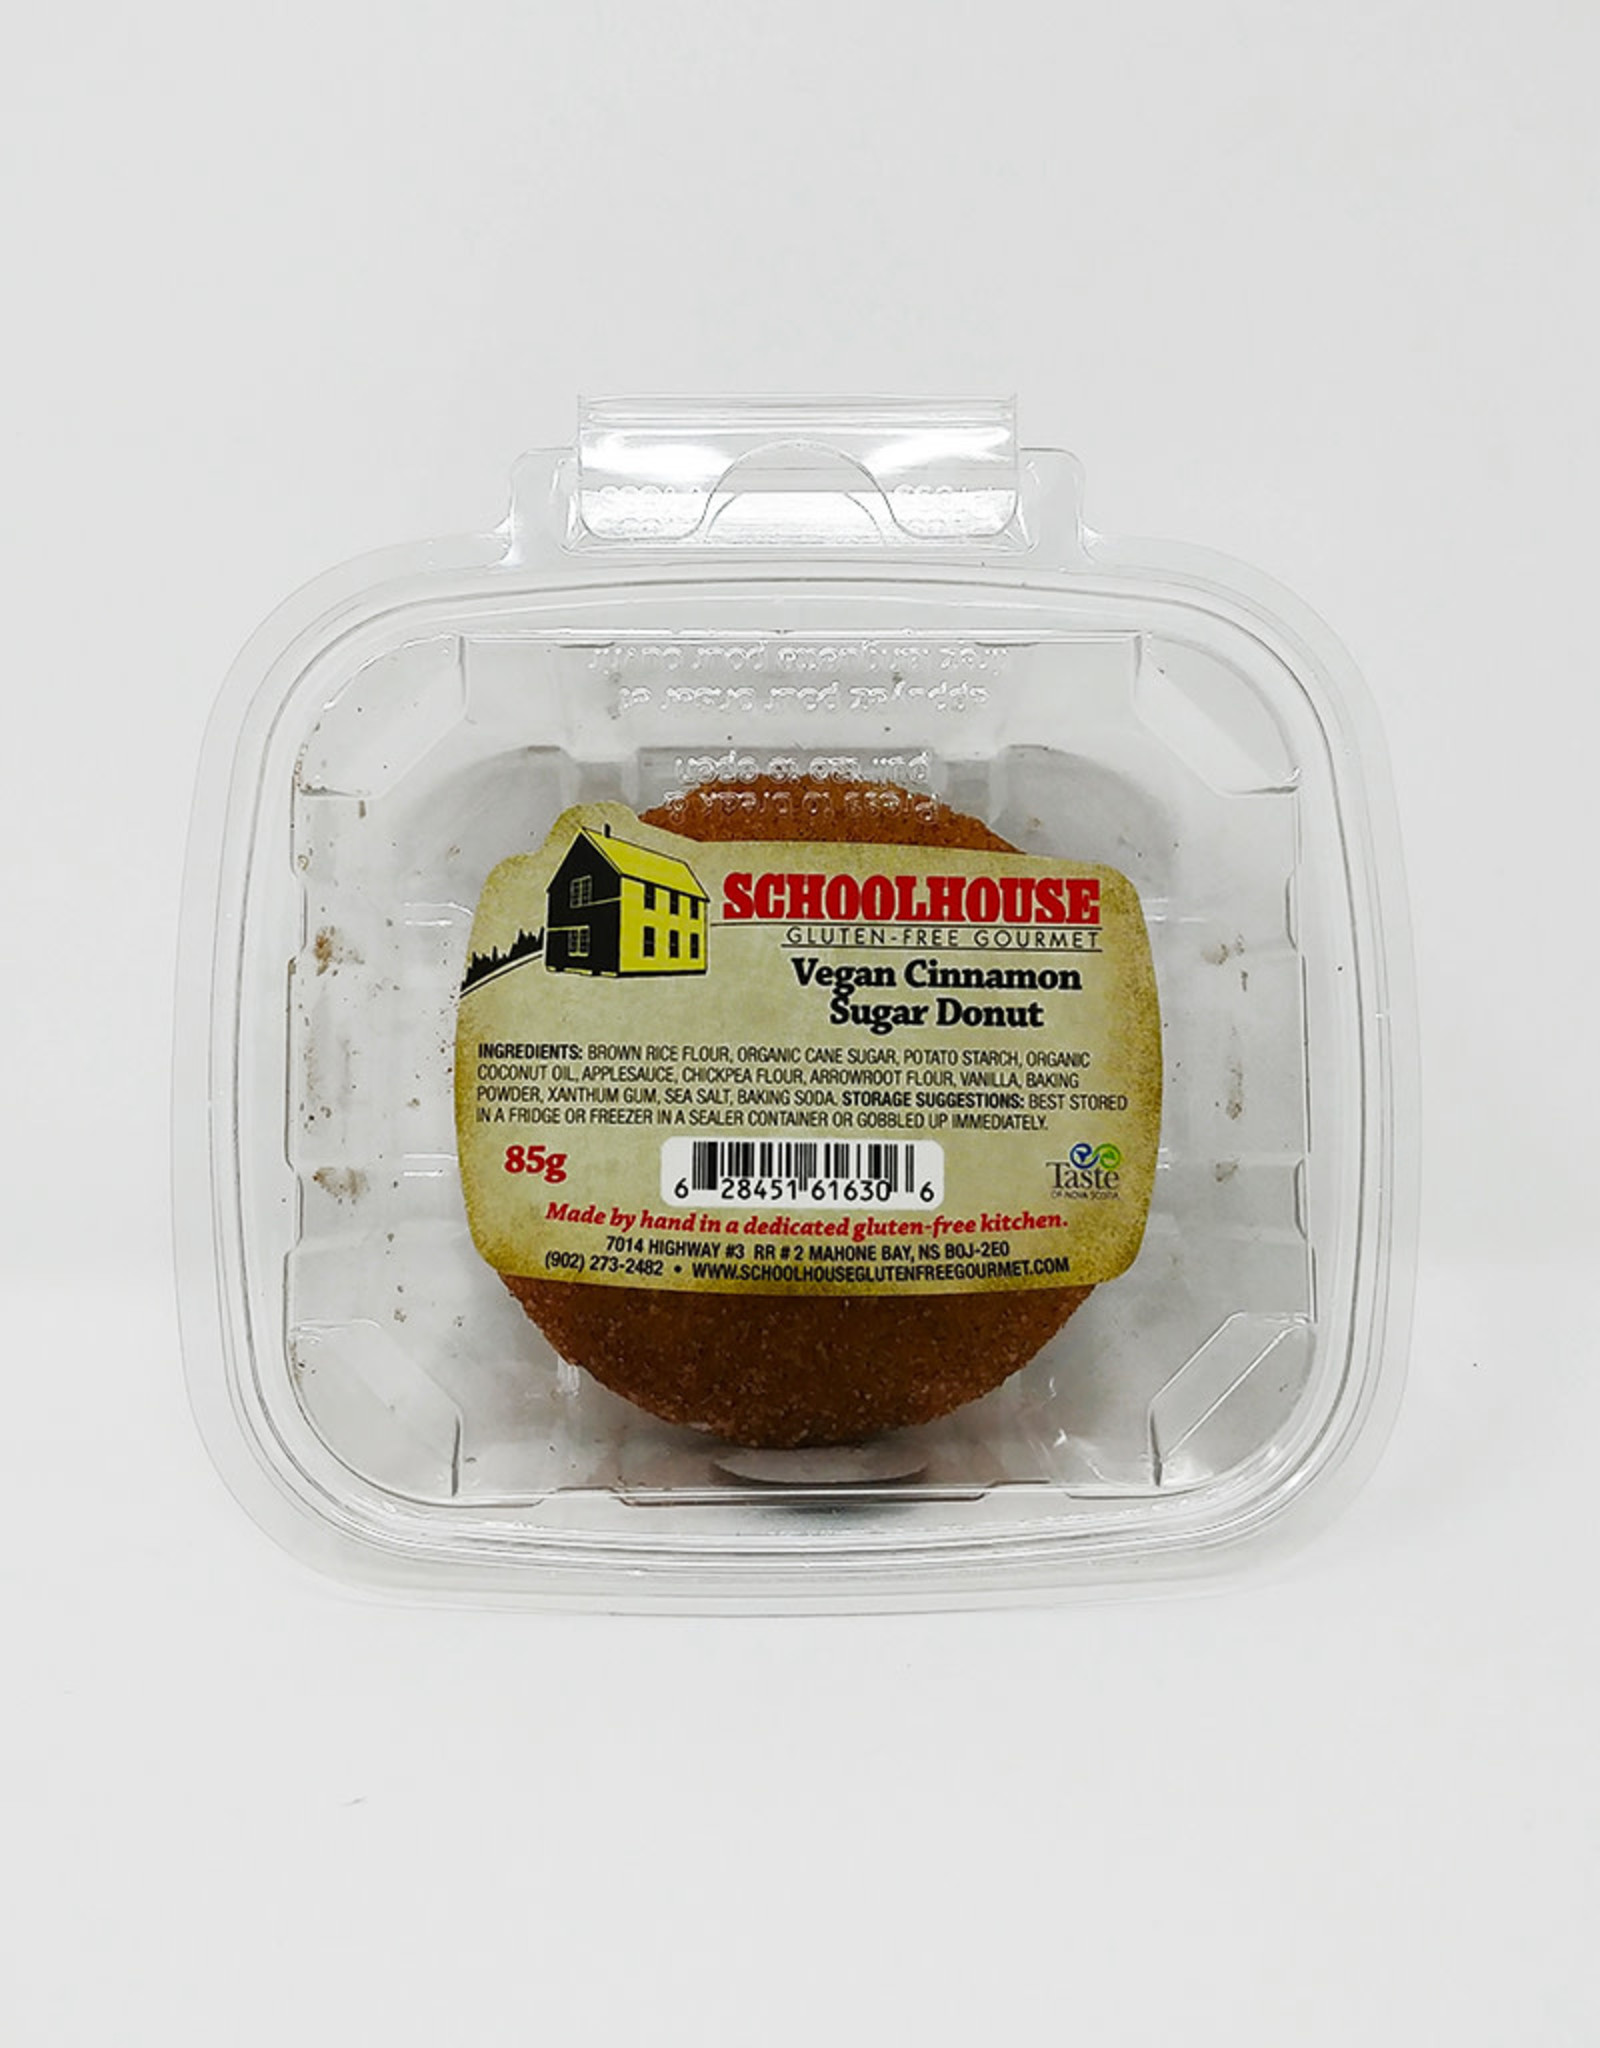 Schoolhouse Gluten-Free Gourmet SchoolHouse Vegan Cinnamon Sugar Doughnut